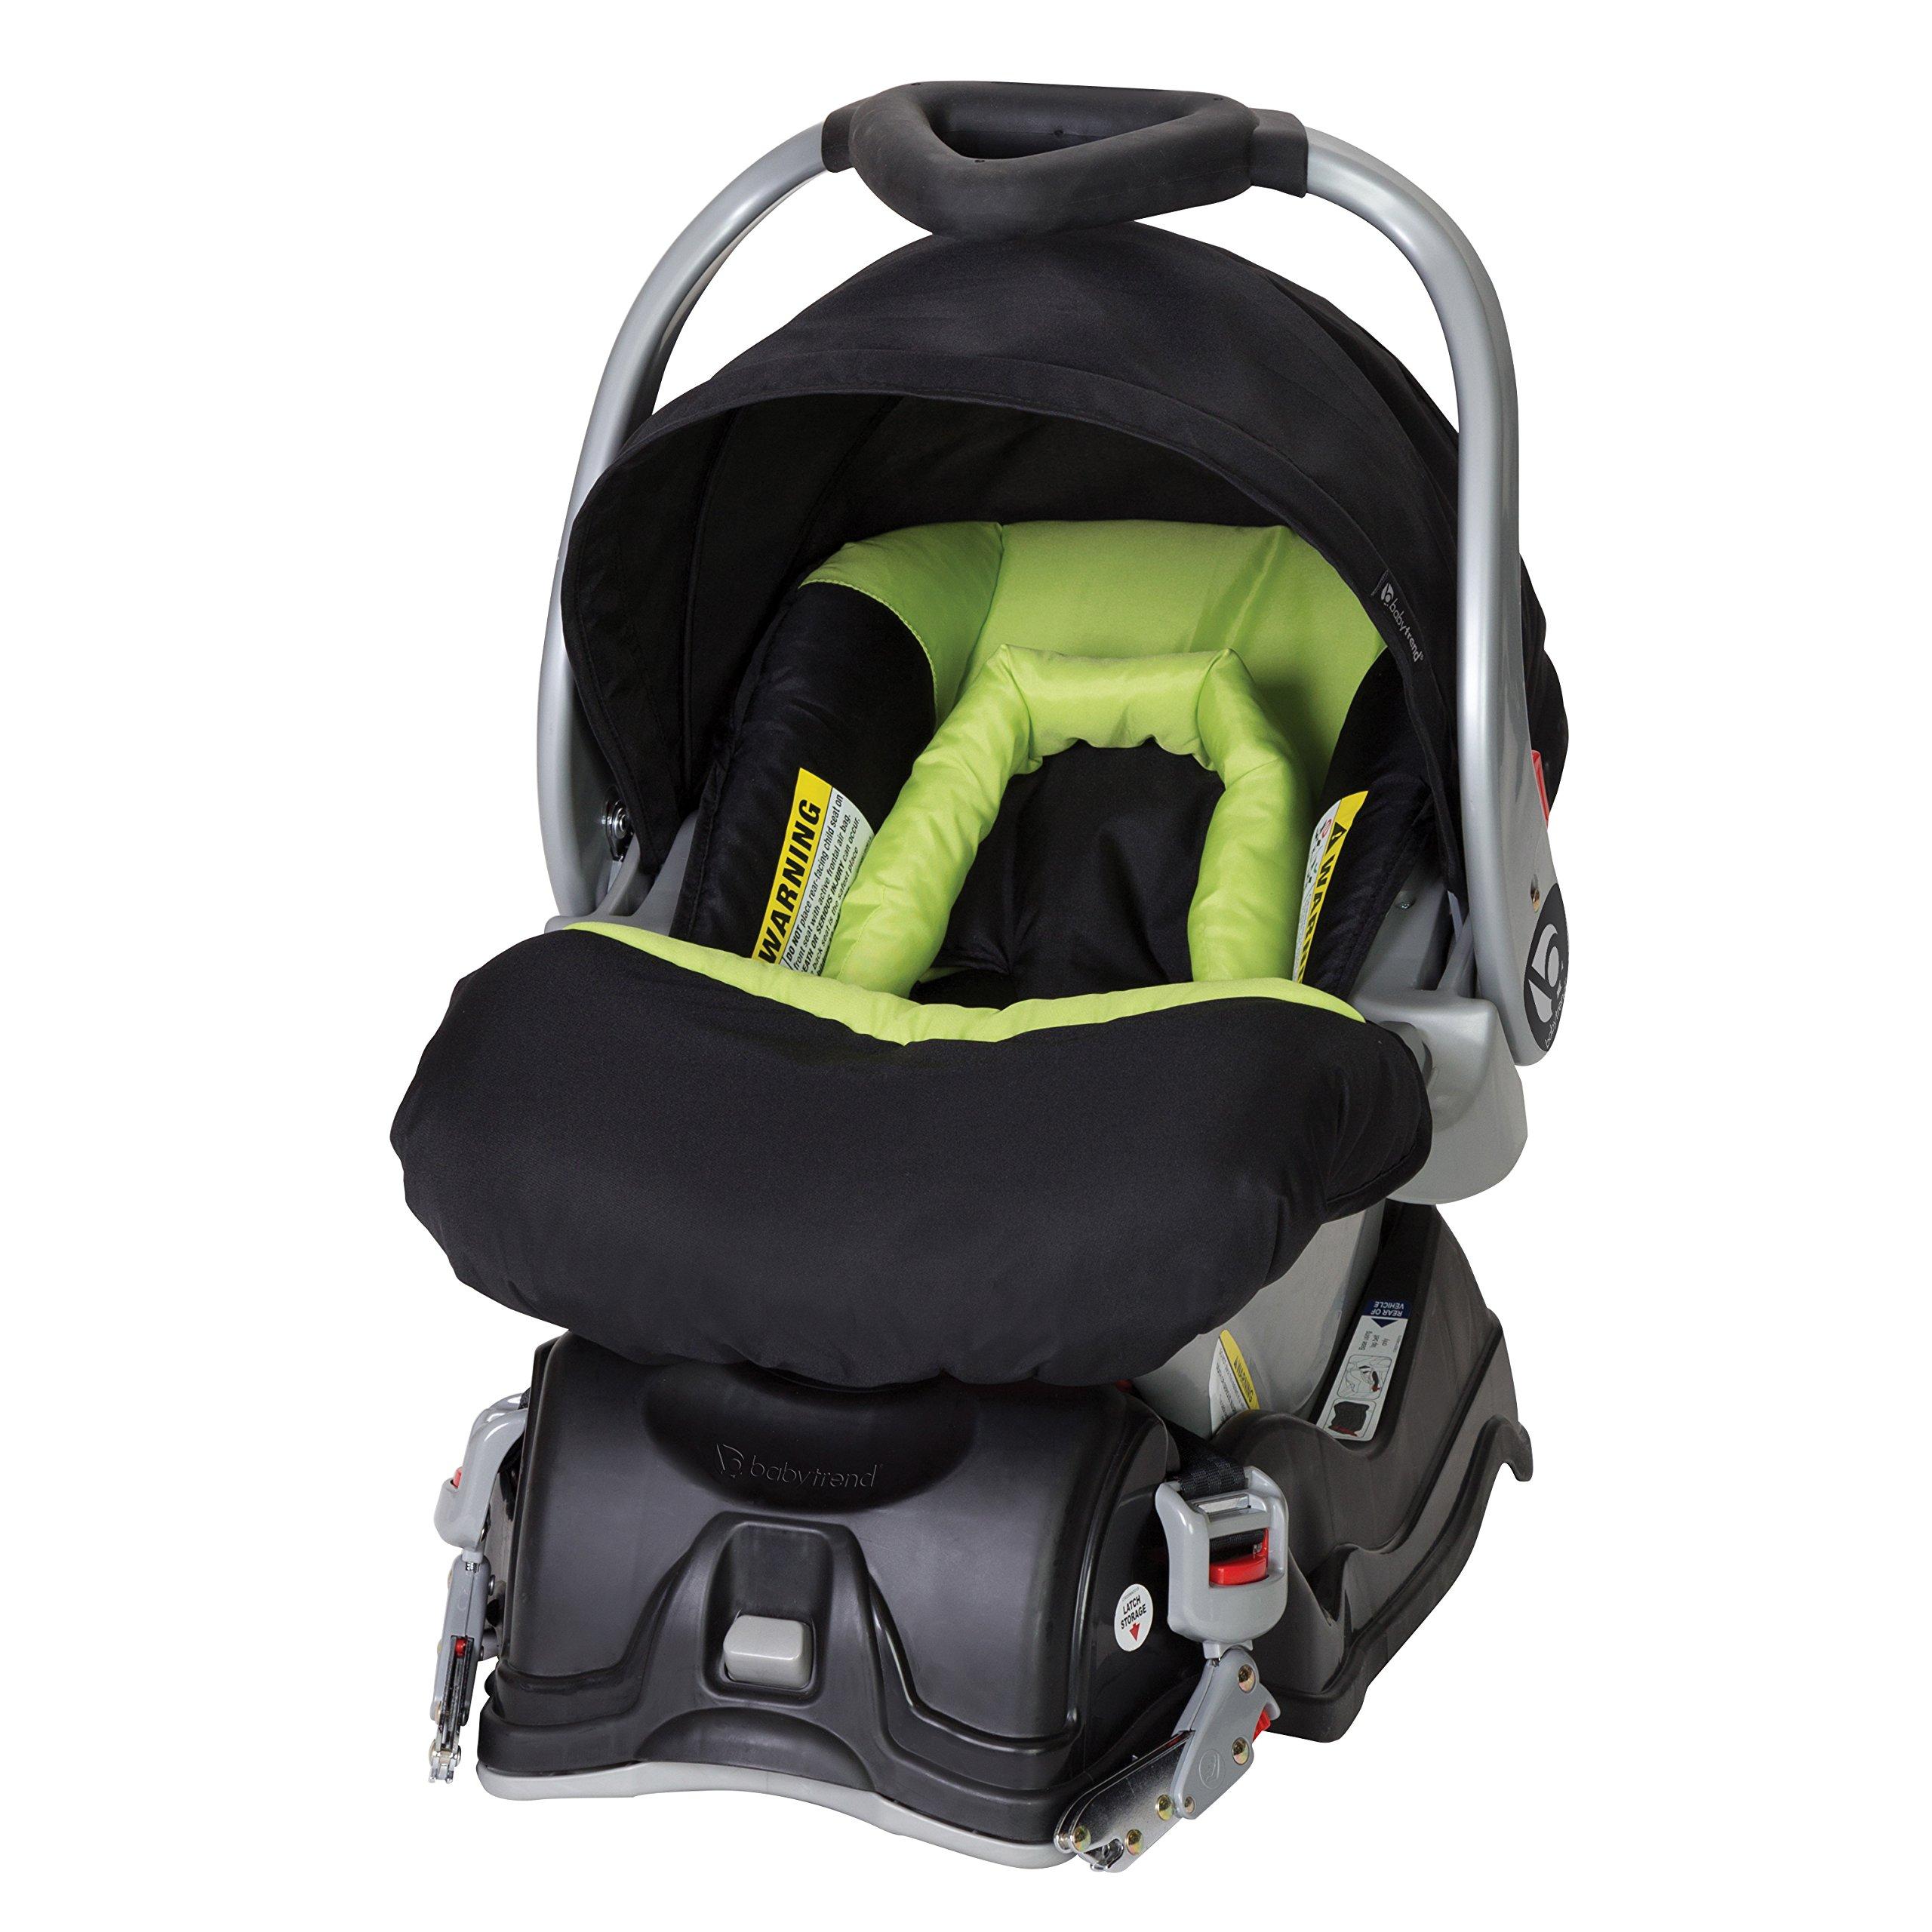 Baby Trend EZ Flec Loc Infant Car Seat, Spring Green